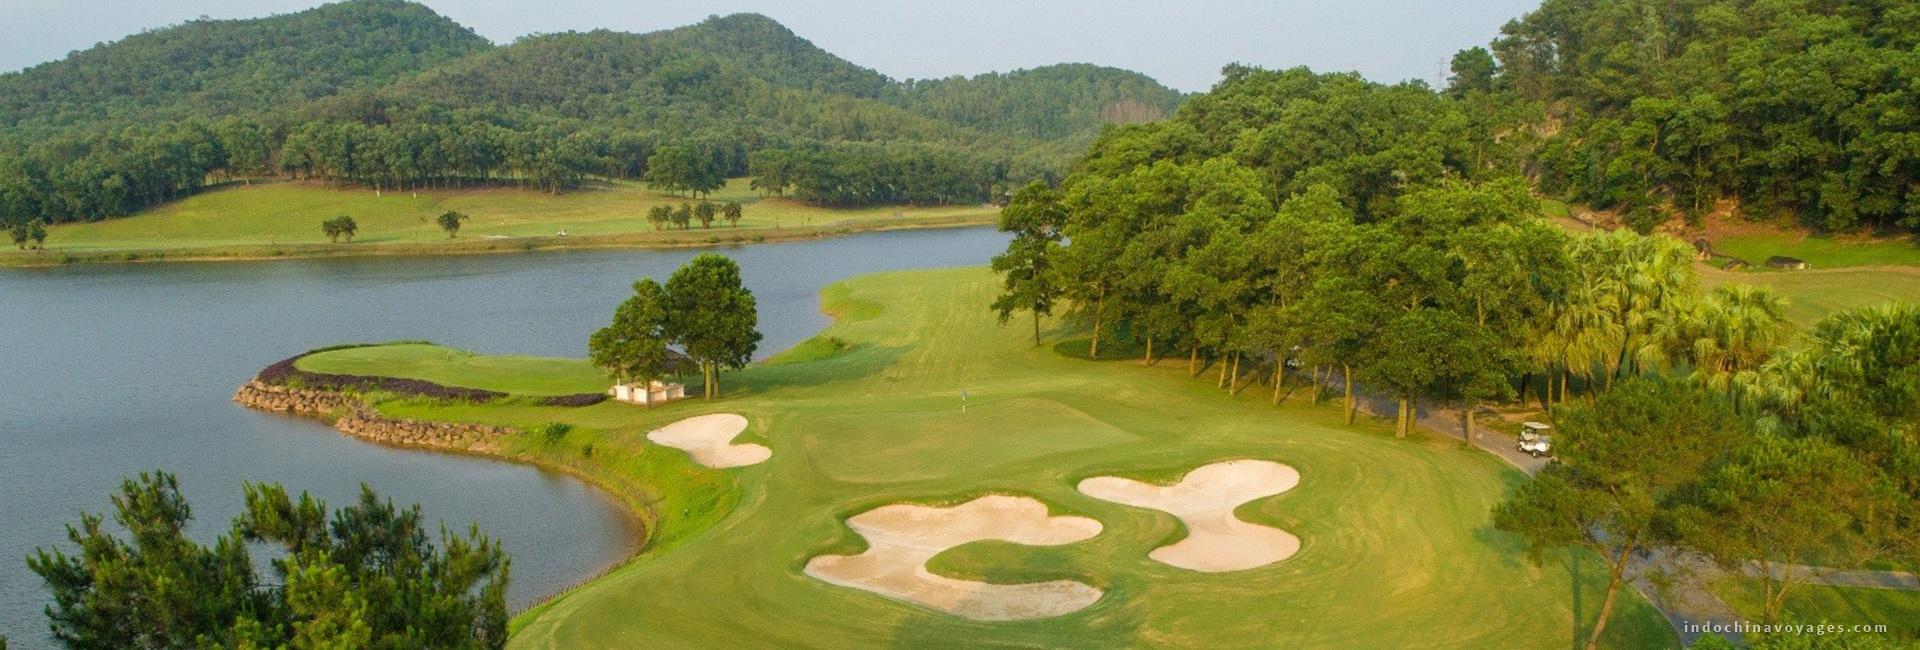 Golf in Hanoi & the Surroundings 5 Days